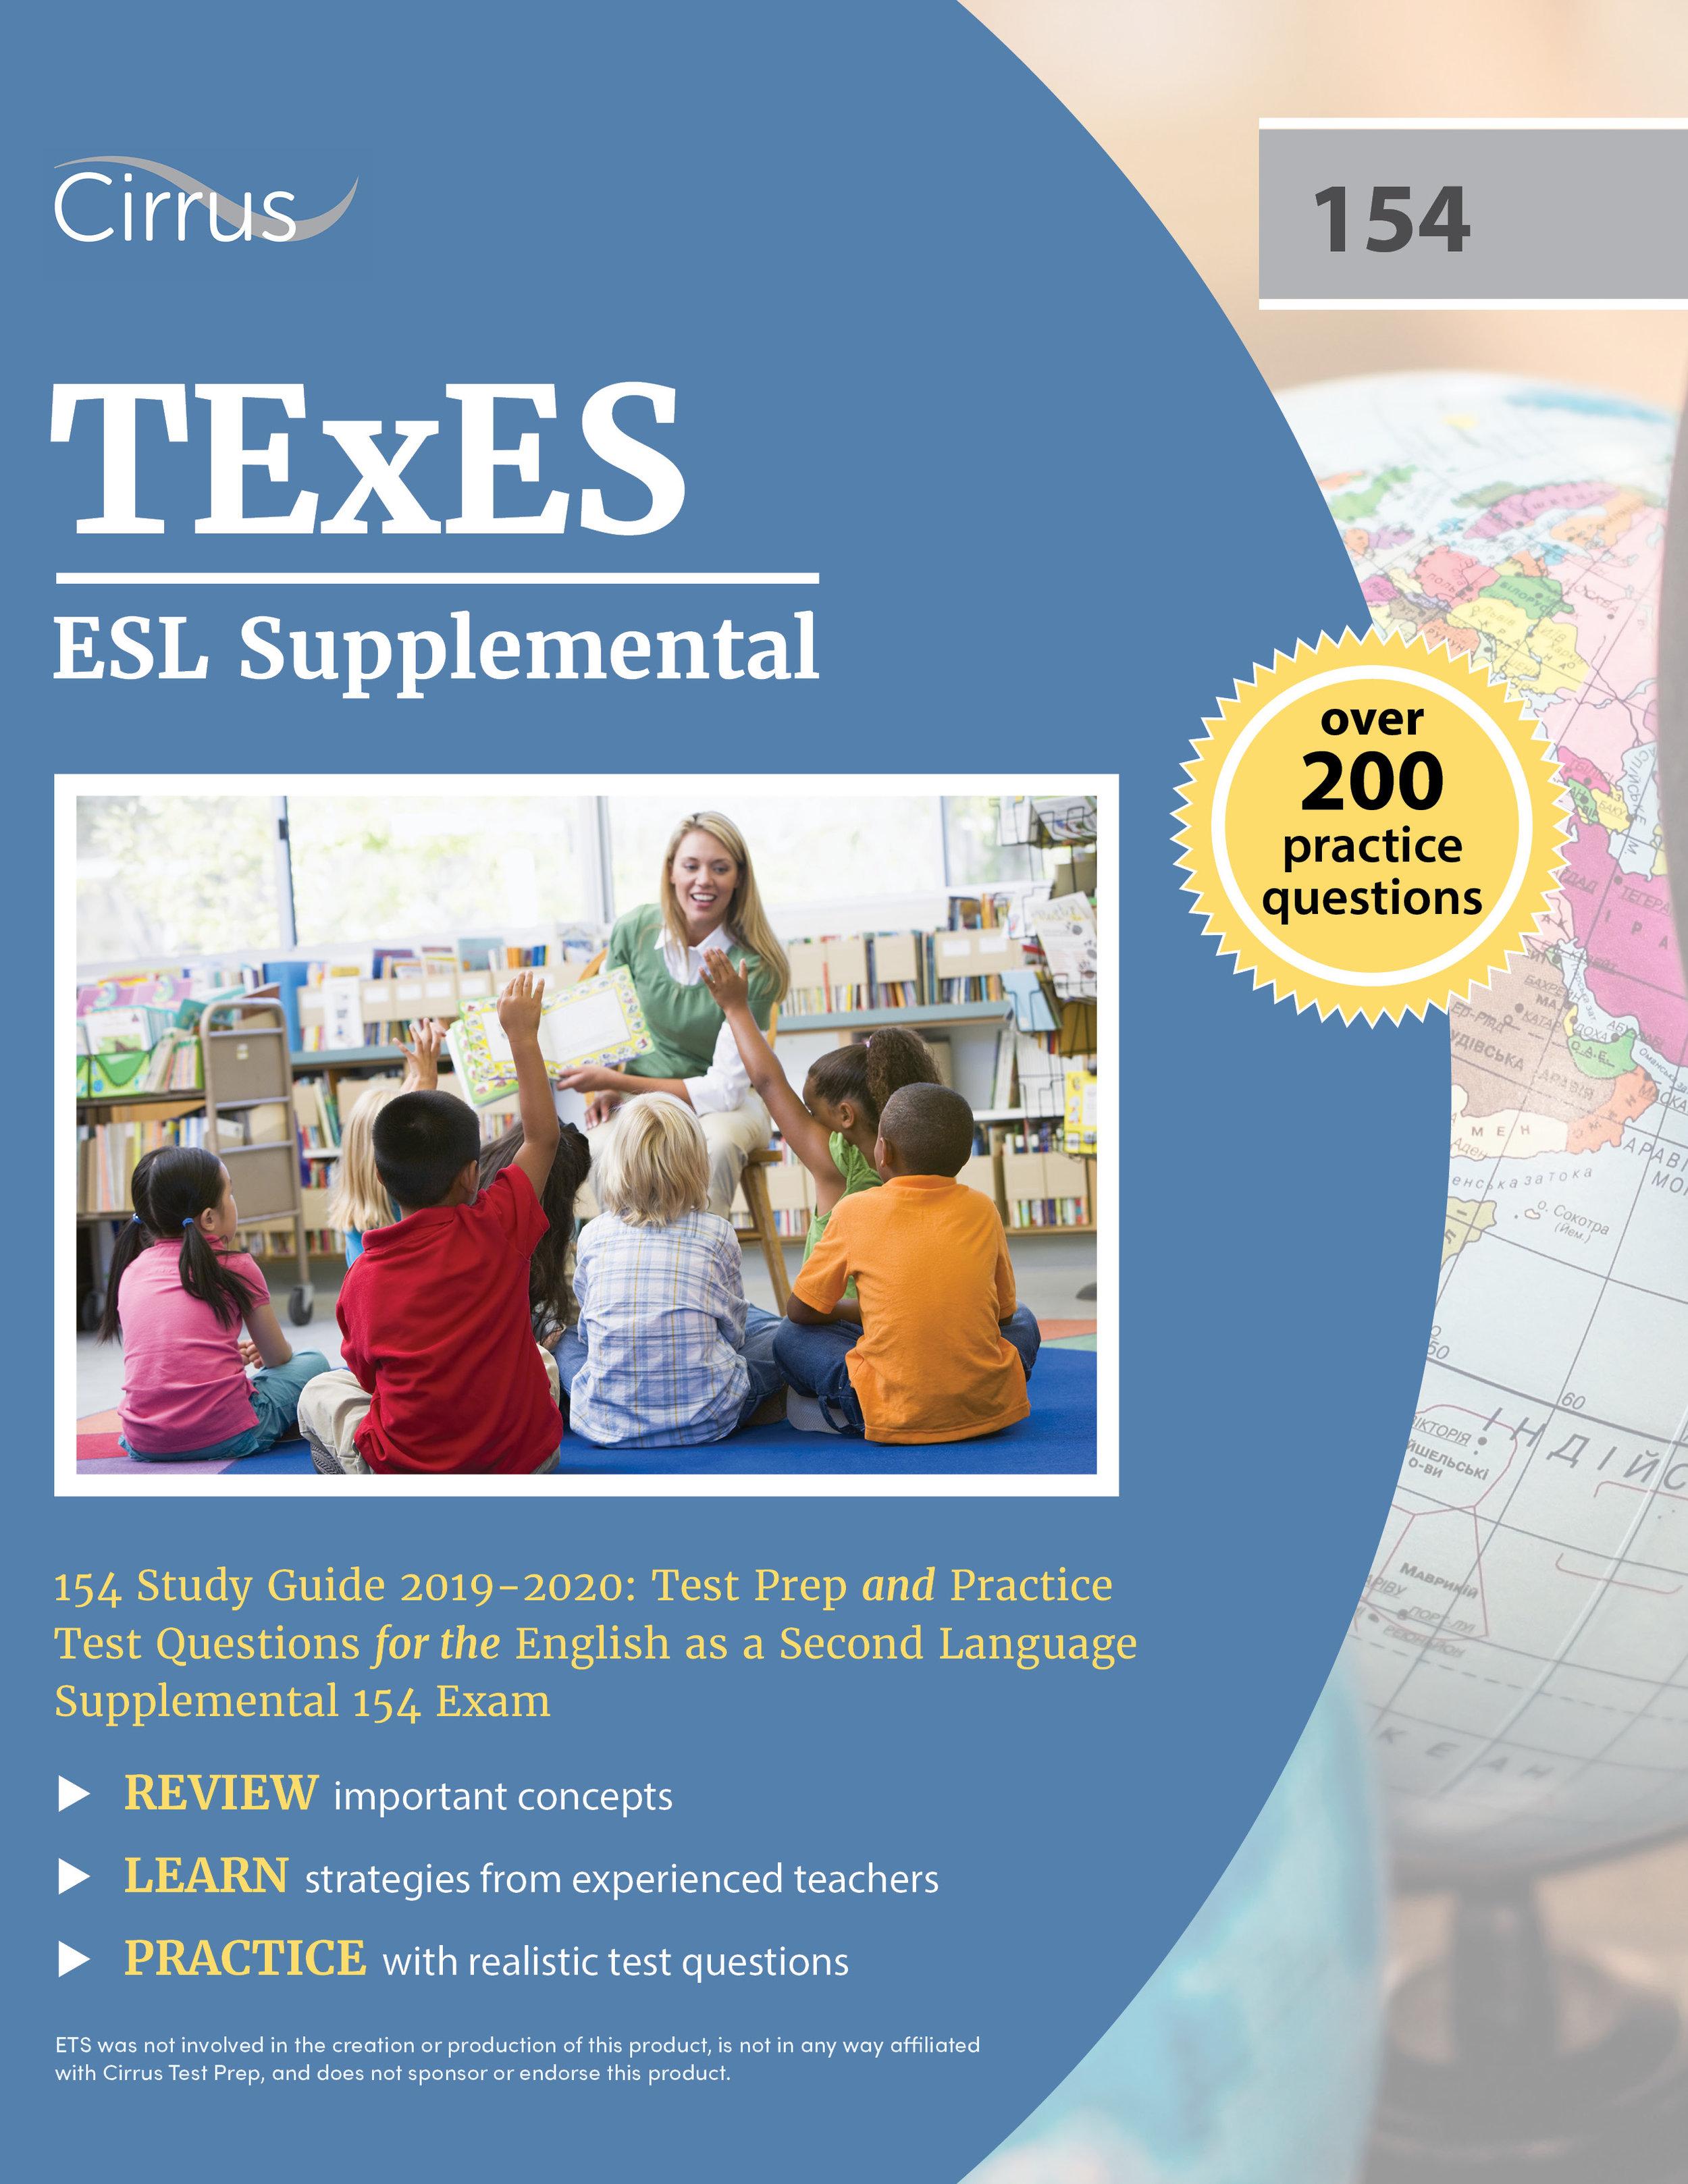 TExES_cover_website.jpg